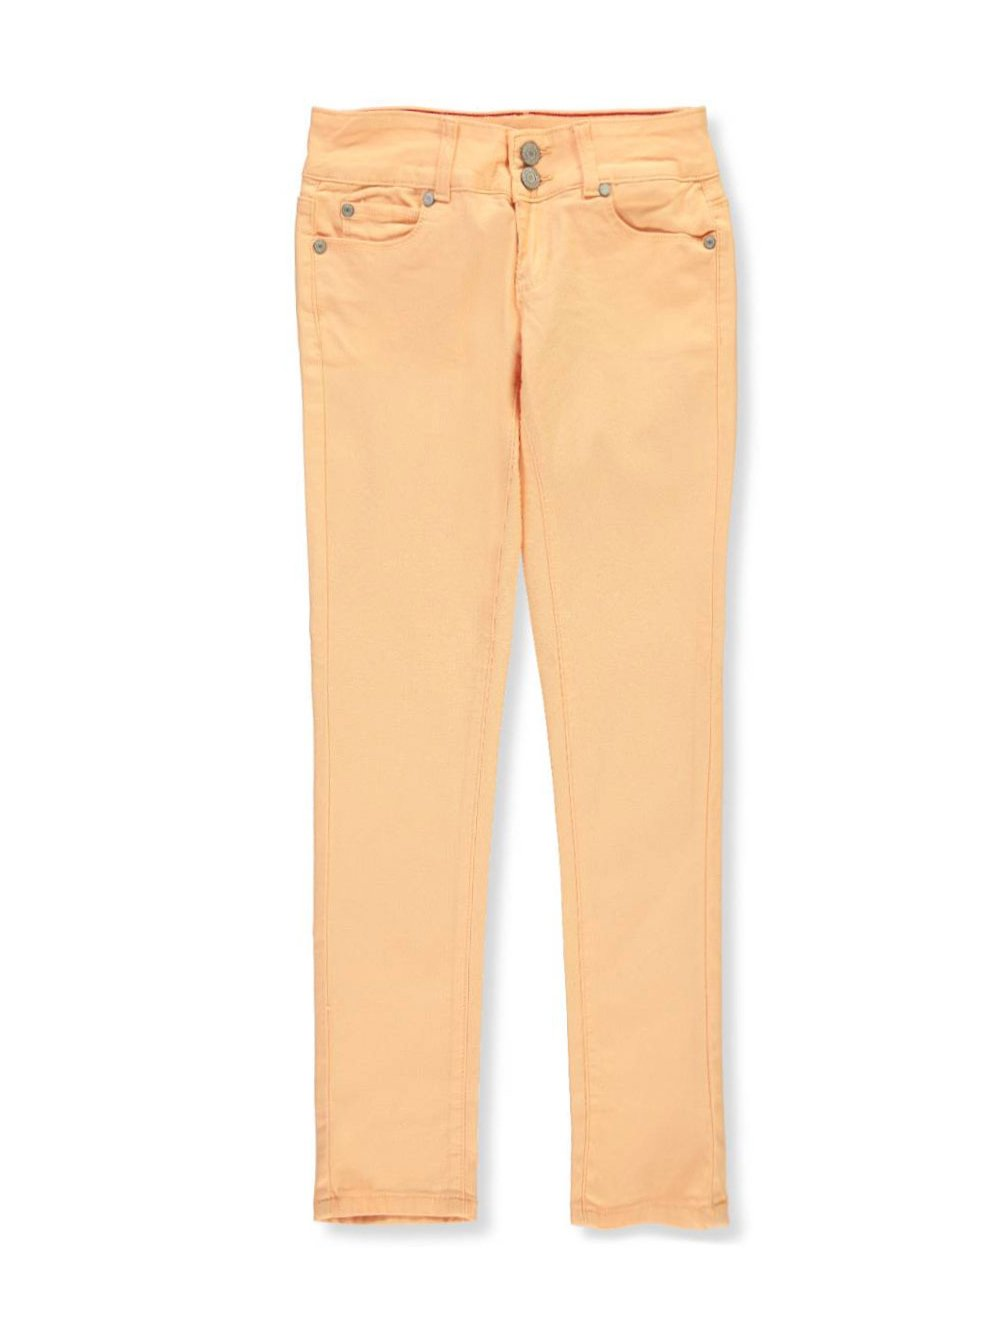 GOGO Girls' Skinny Jeans GOGO Girls' Skinny Jeans